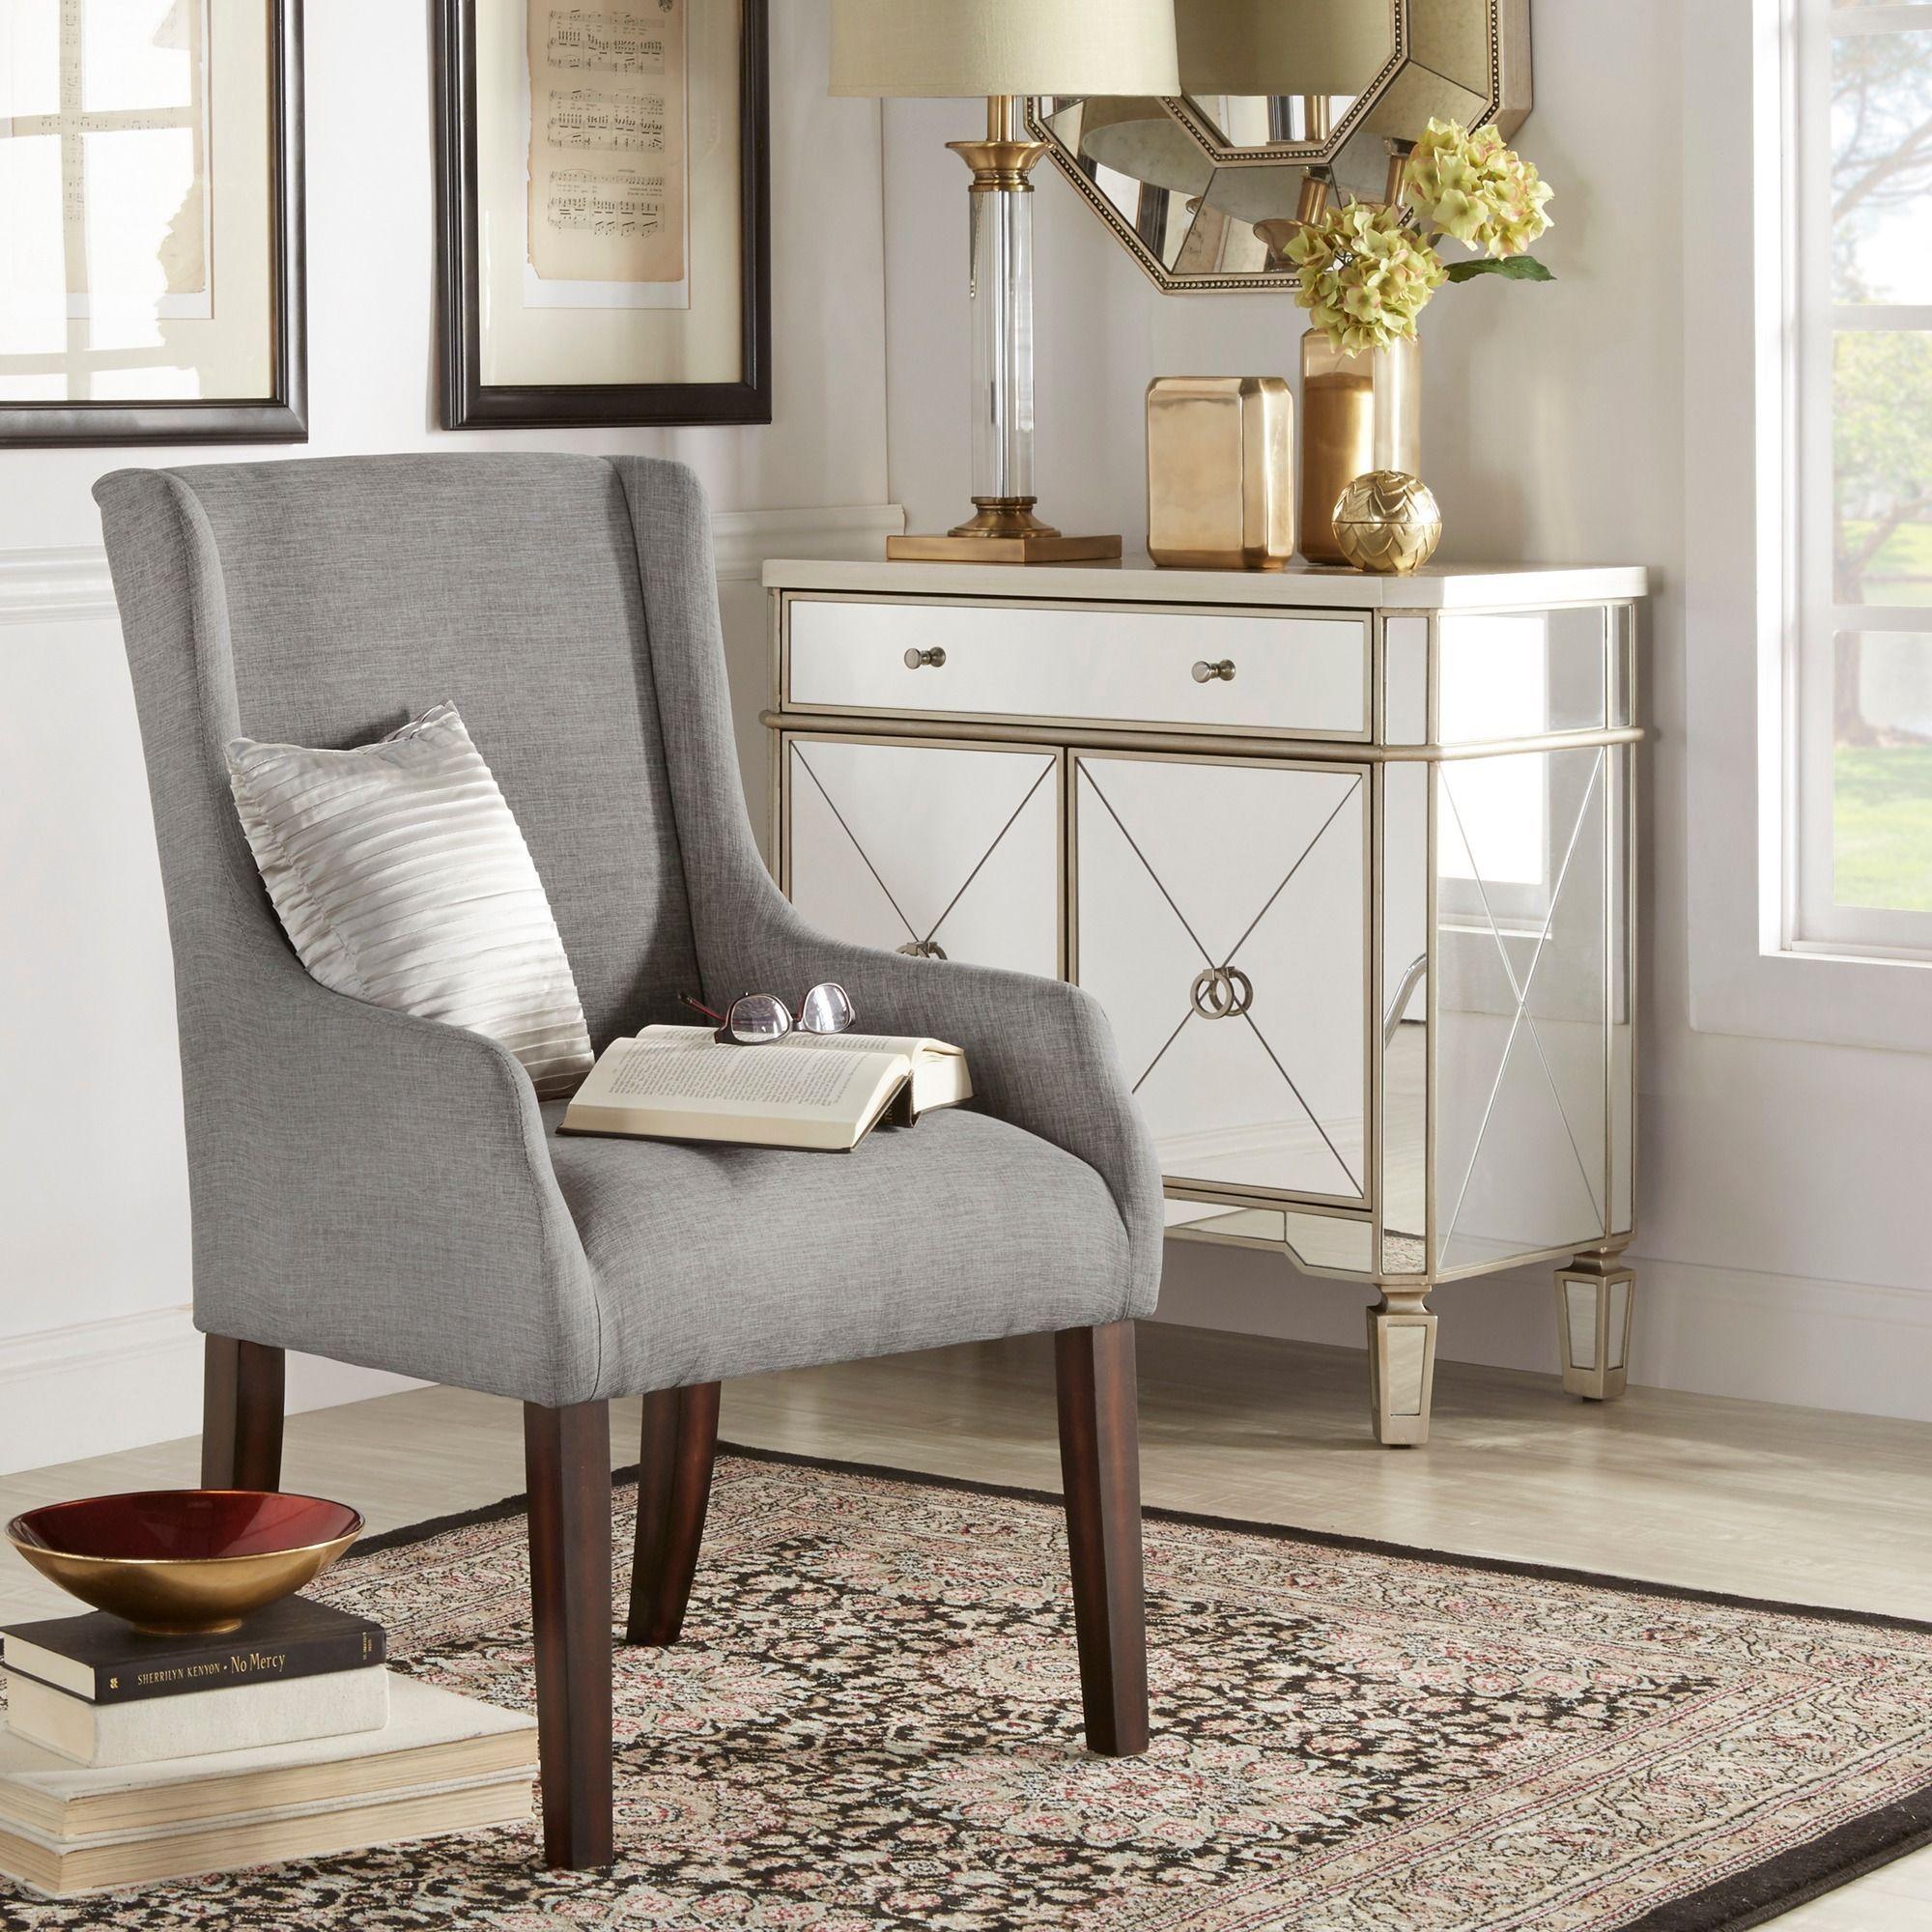 INSPIRE Q Jourdan Linen Sloped Arm Hostess Chair | Overstock.com Shopping -  The Best